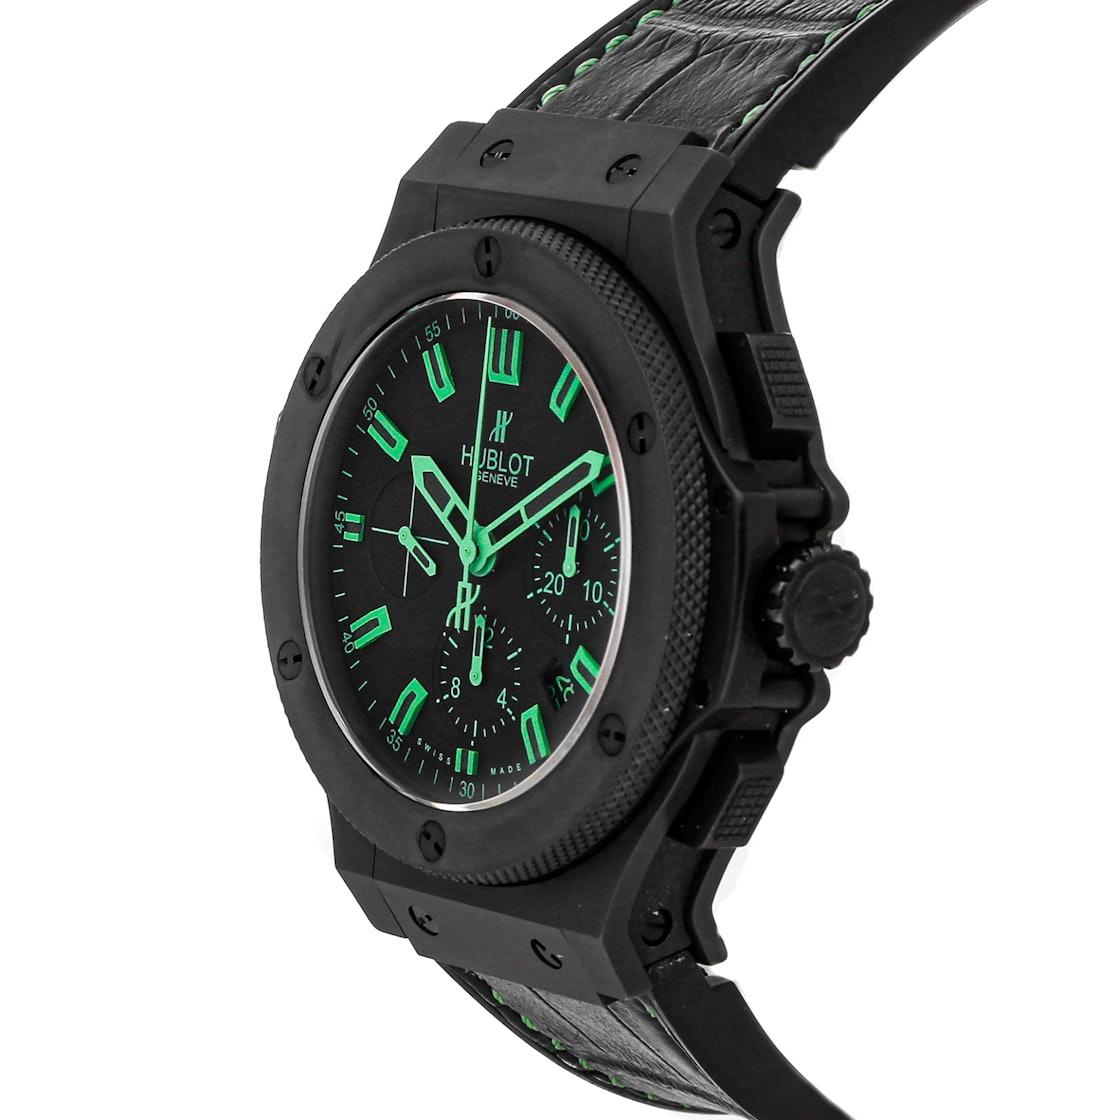 Hublot Big Bang All Black Green Limited Edition 301.CI.1190.GR.ABG11